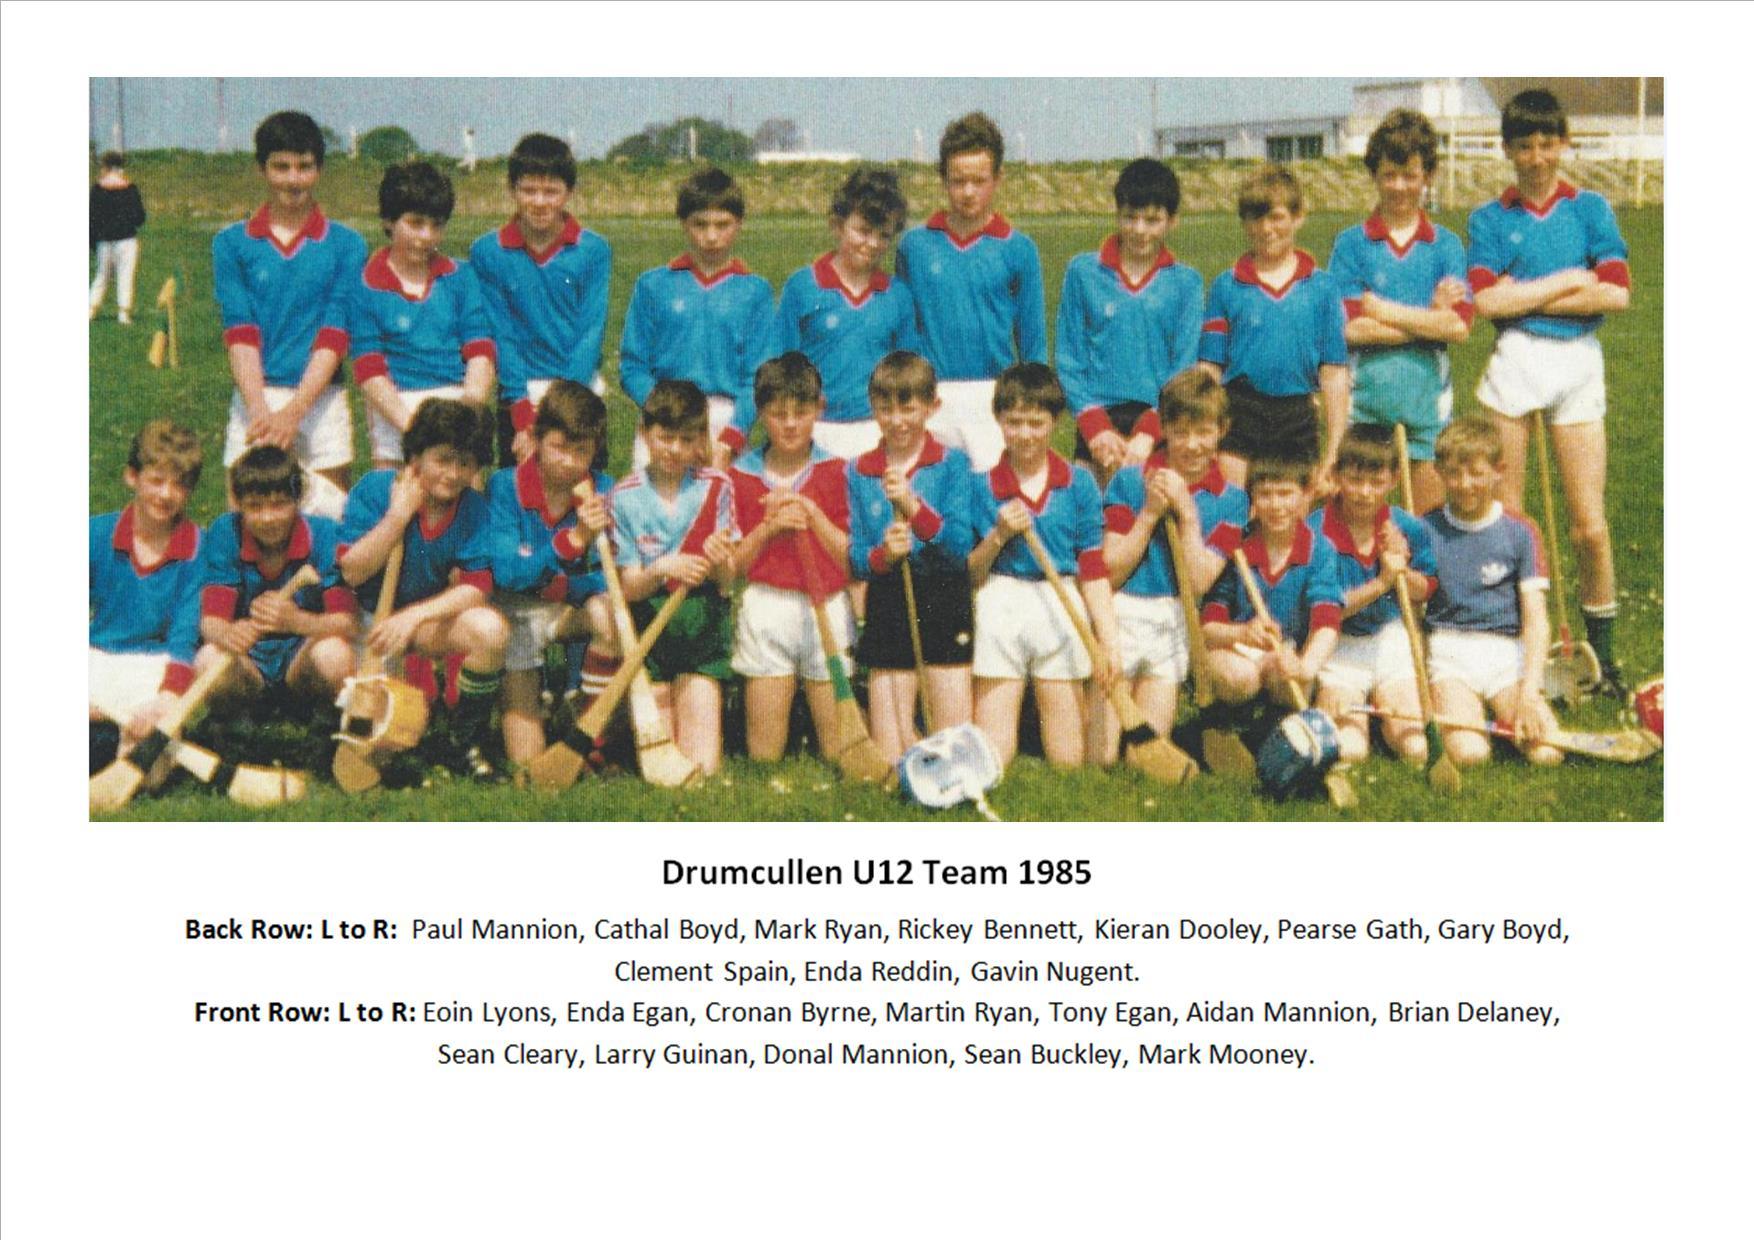 Drumcullen U12 Team - 1985